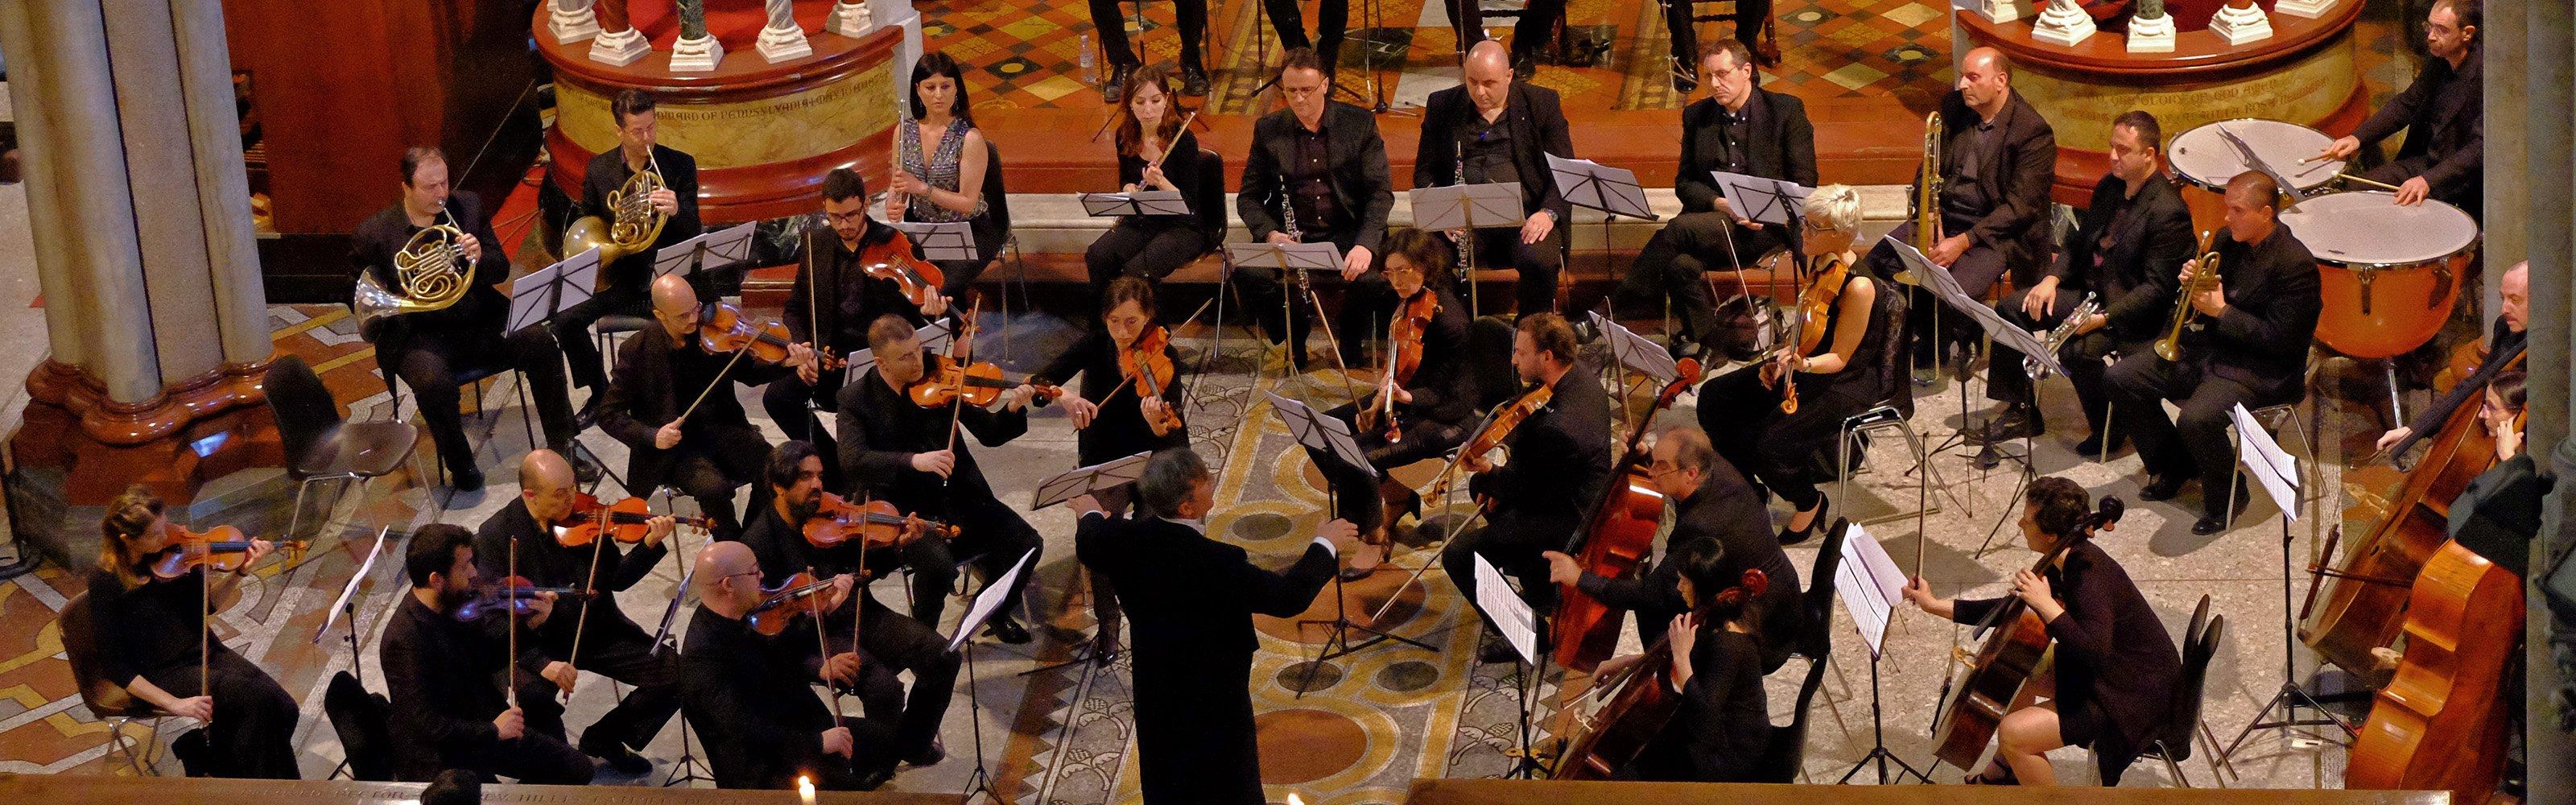 Rome Symphony Orchestra 6